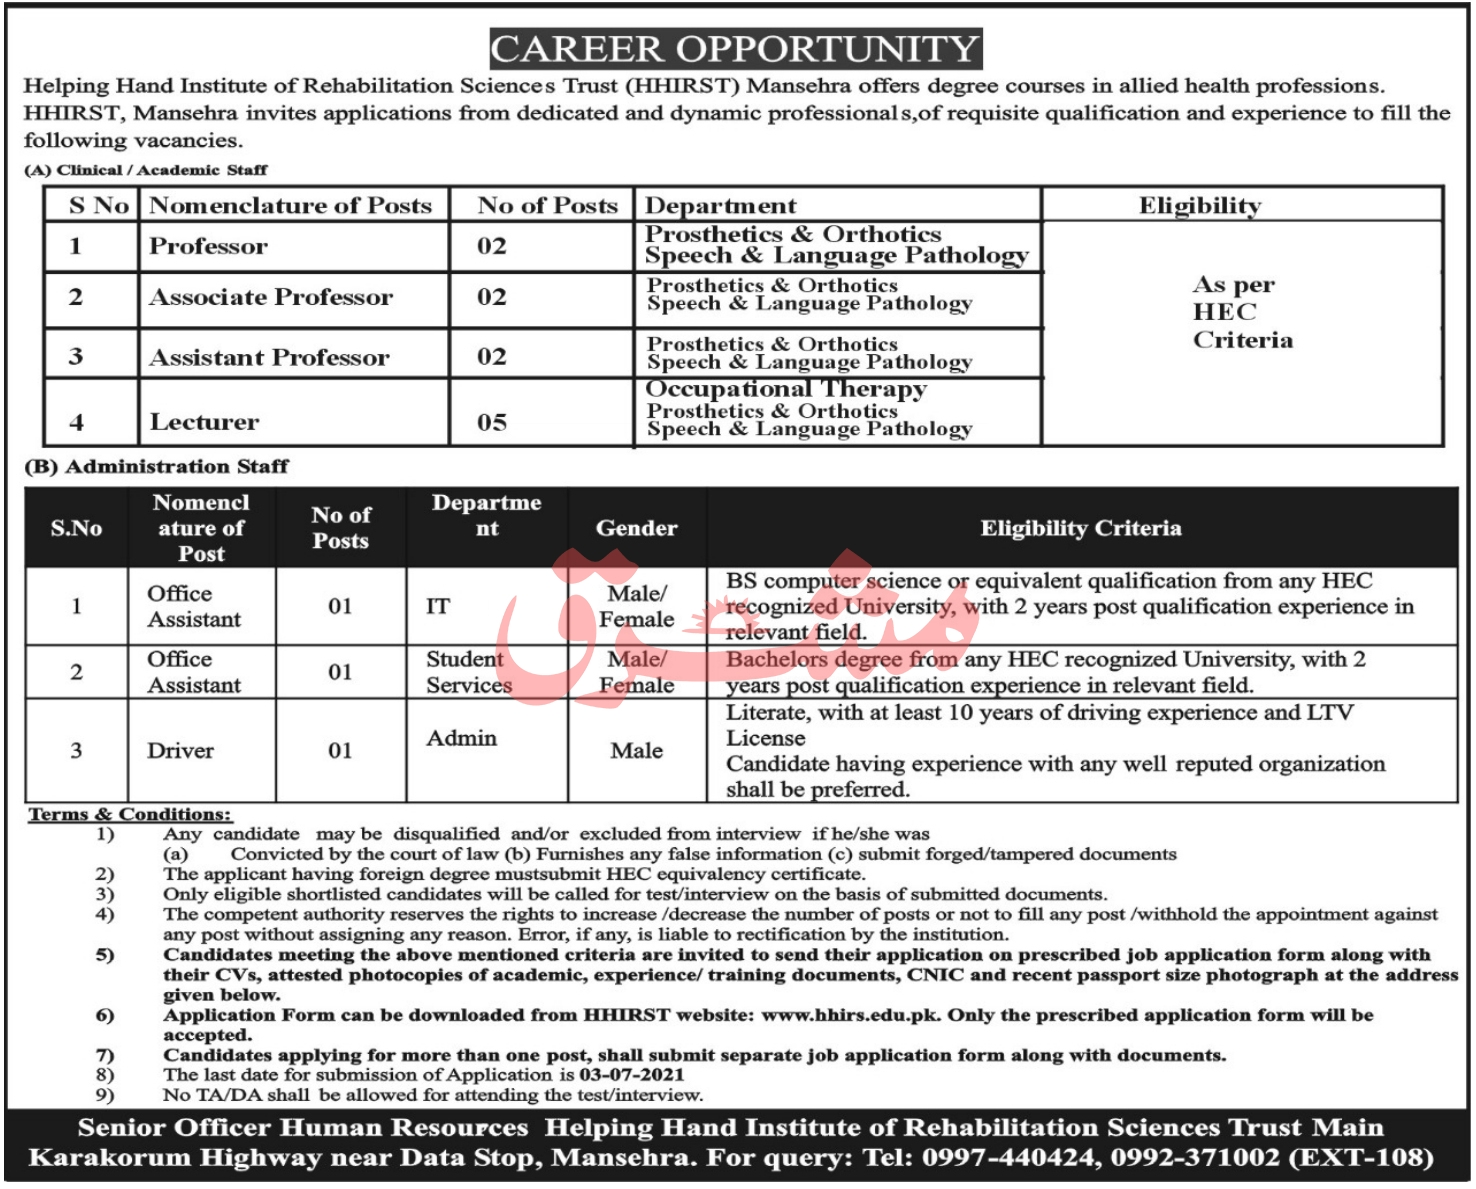 www.hhirs.edu.pk Jobs 2021 - Helping Hand Institute of Rehabilitation Sciences Trust (HHIRST) Jobs 2021 in Pakistan